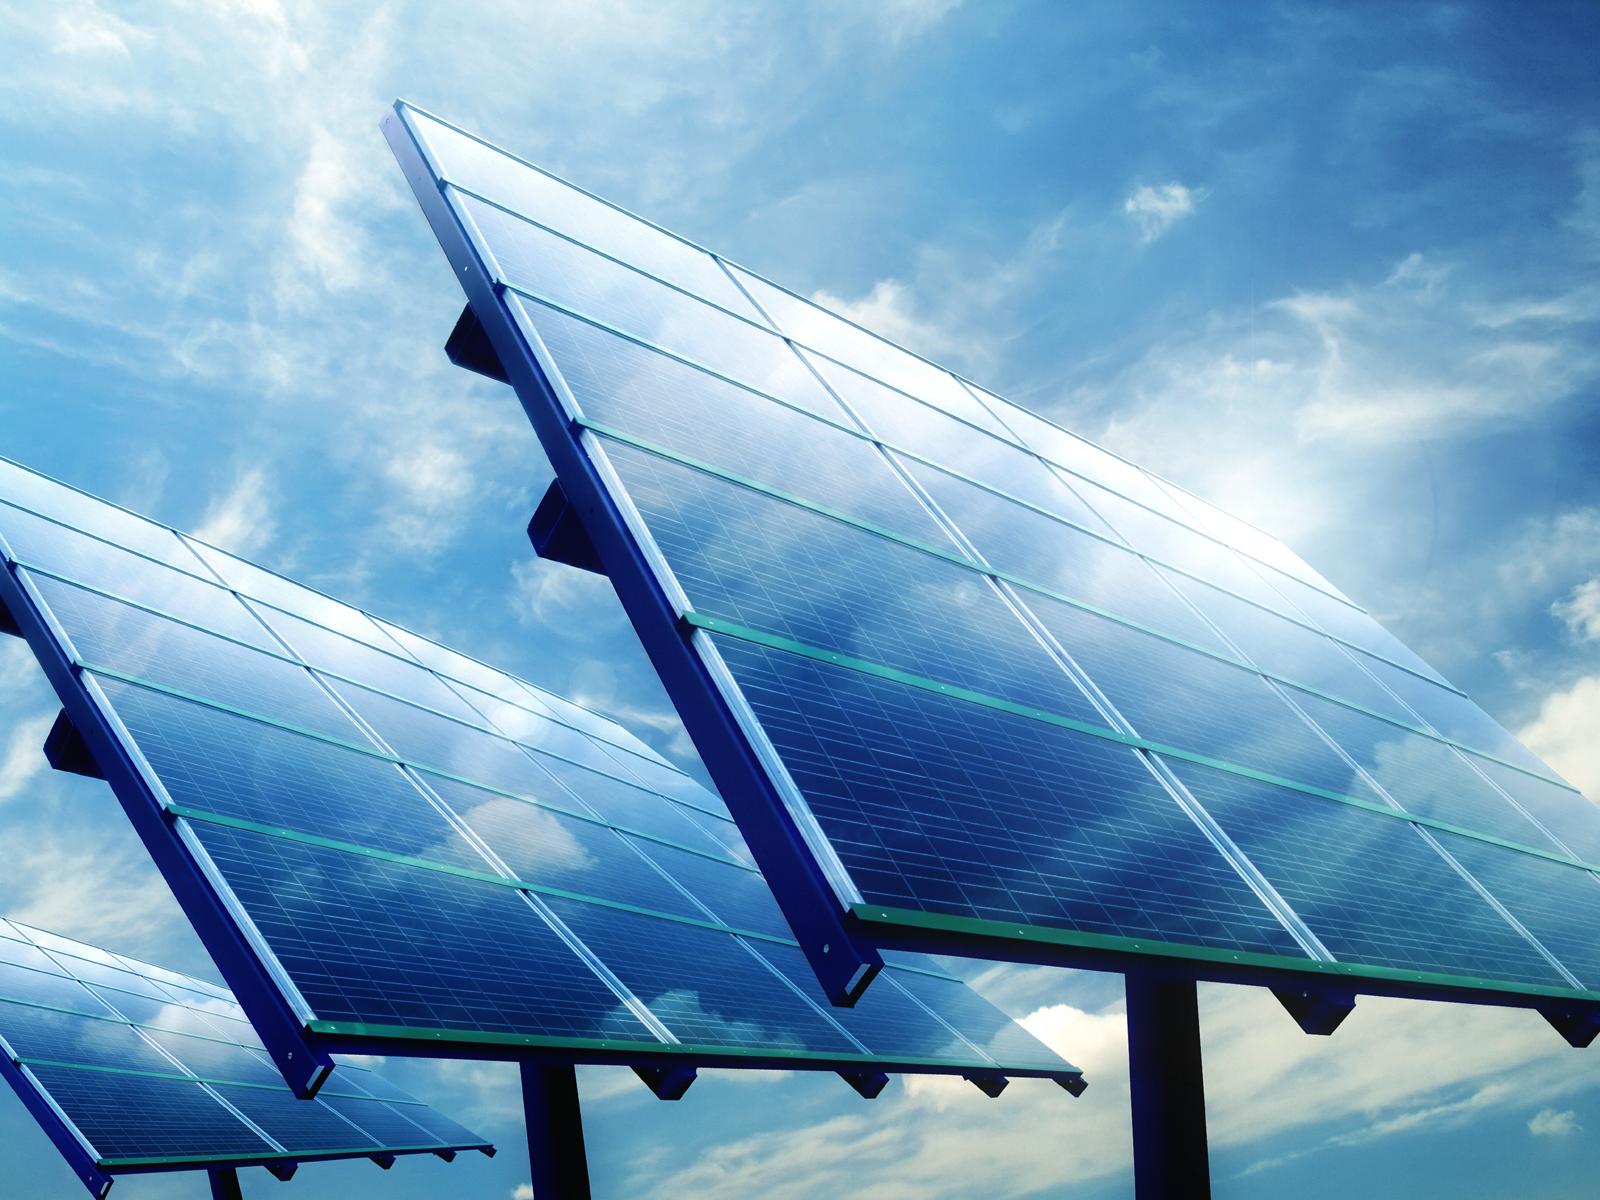 Solar Panels 1600x1200